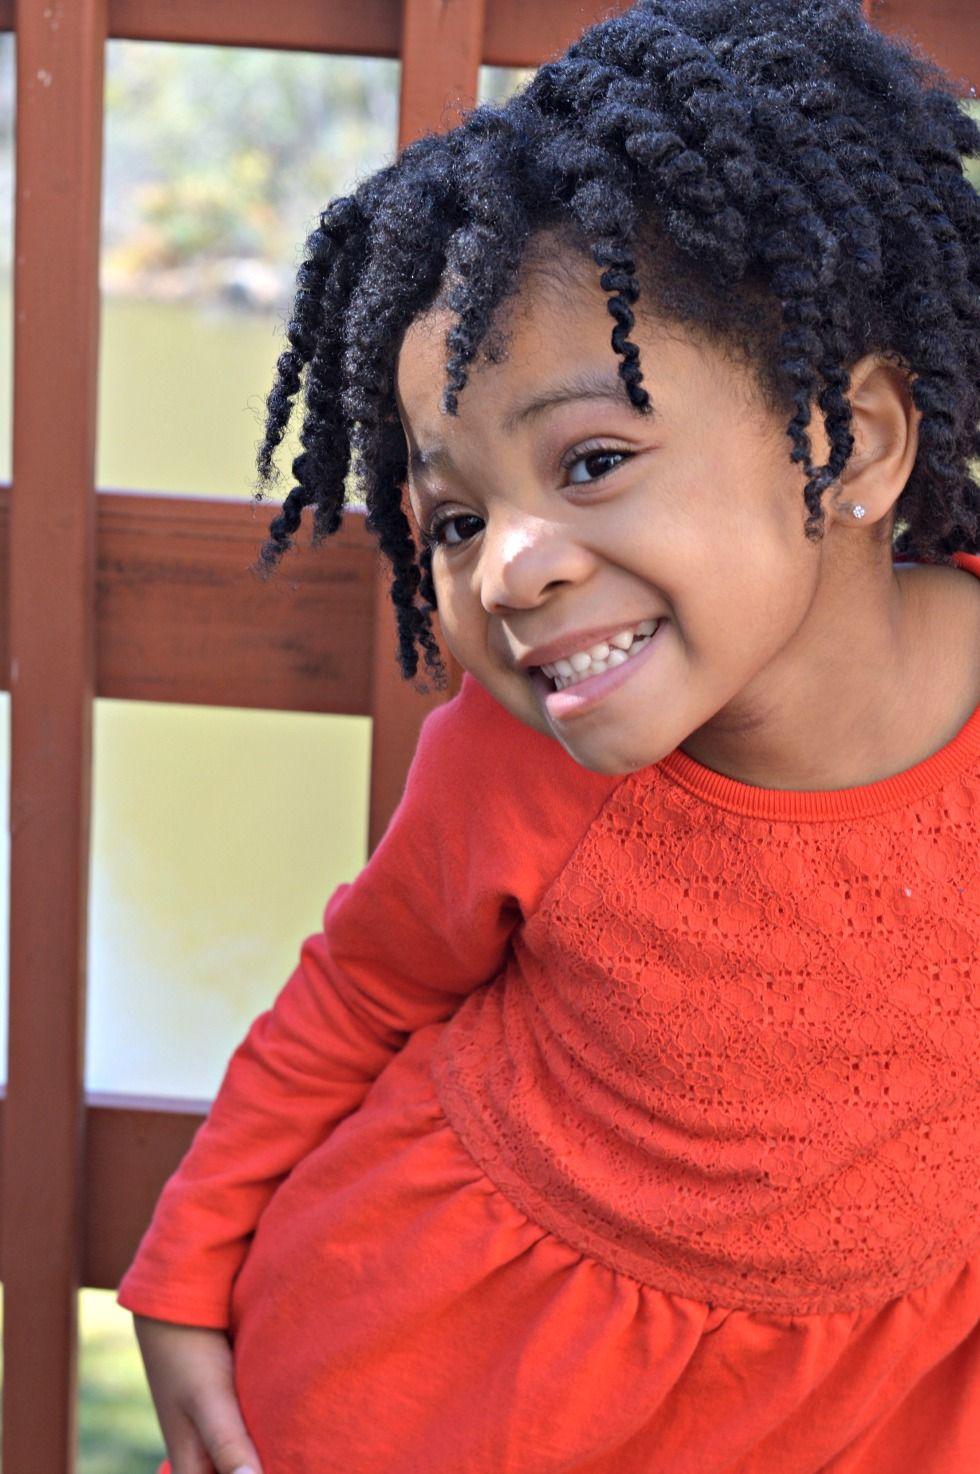 Natural Kids 3 Tips For Keeping Dry Hair Moisturized Ppl